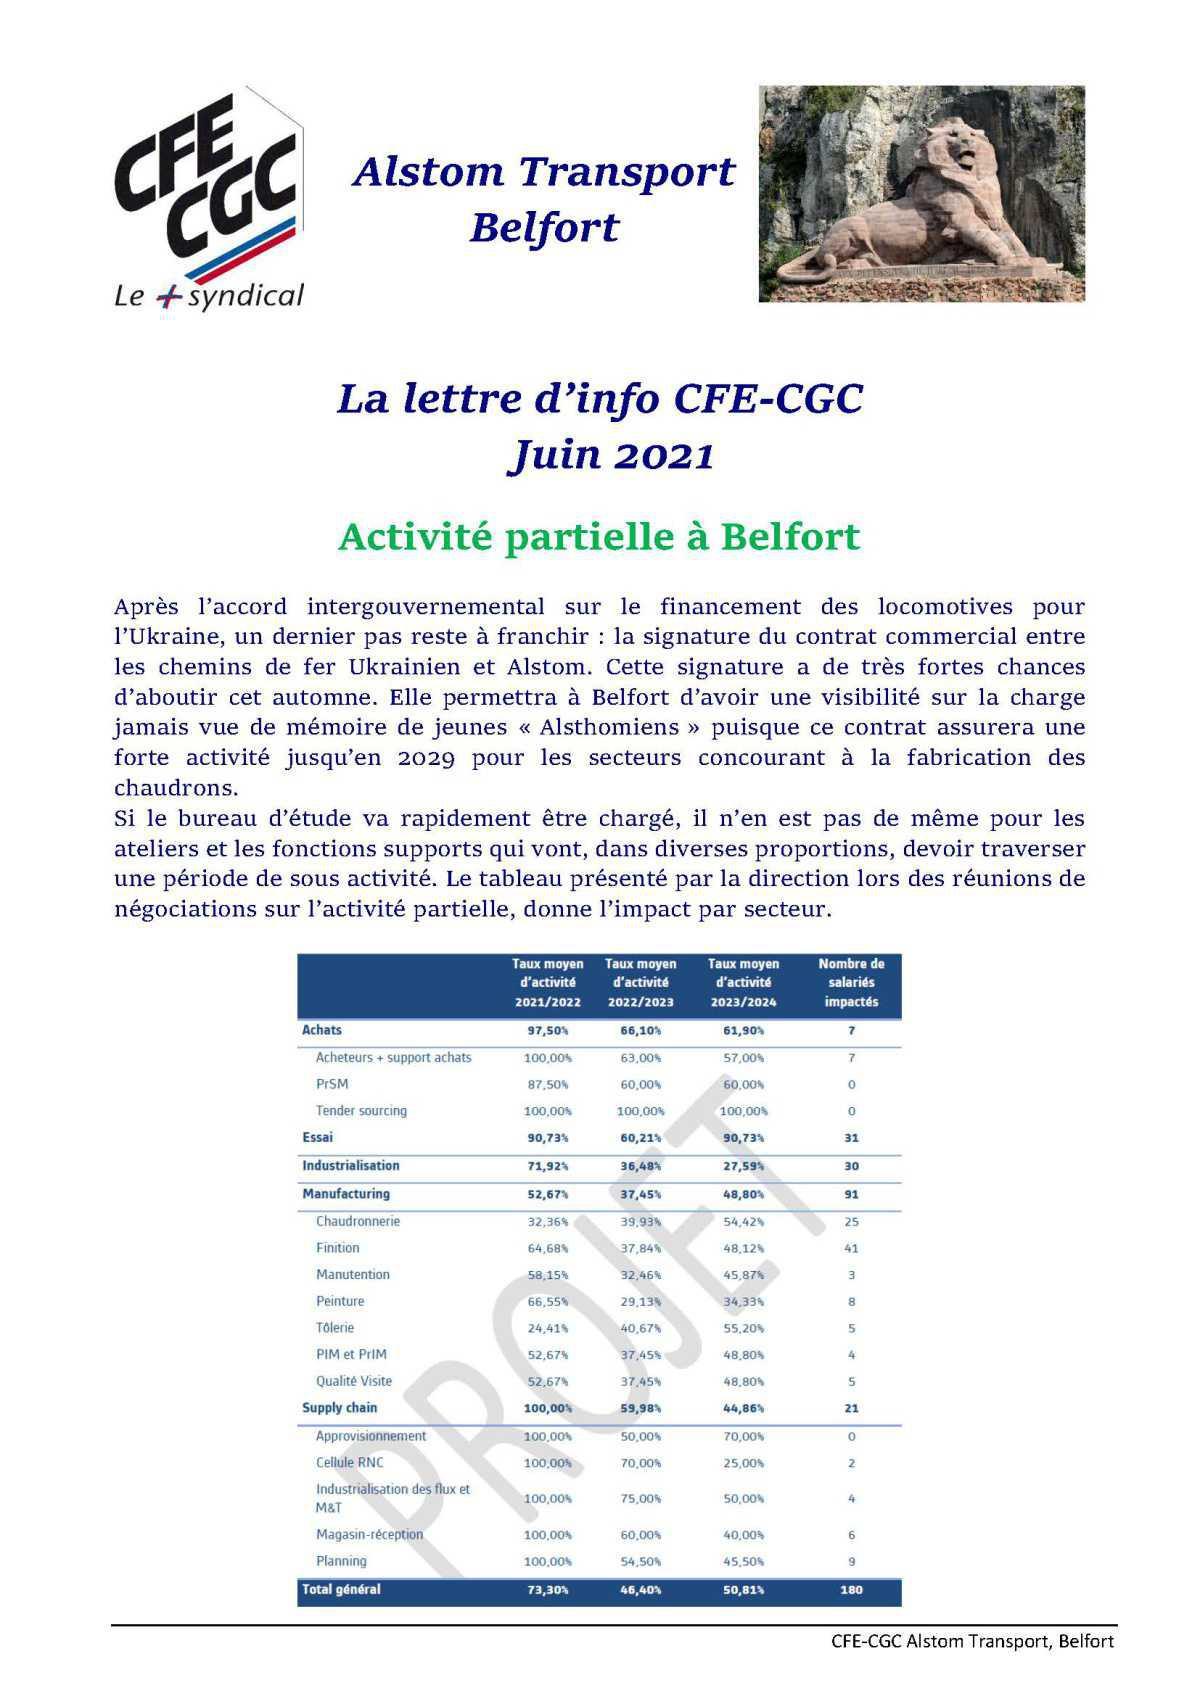 Lettre d'info Alstom Transport Belfort Juin 2021